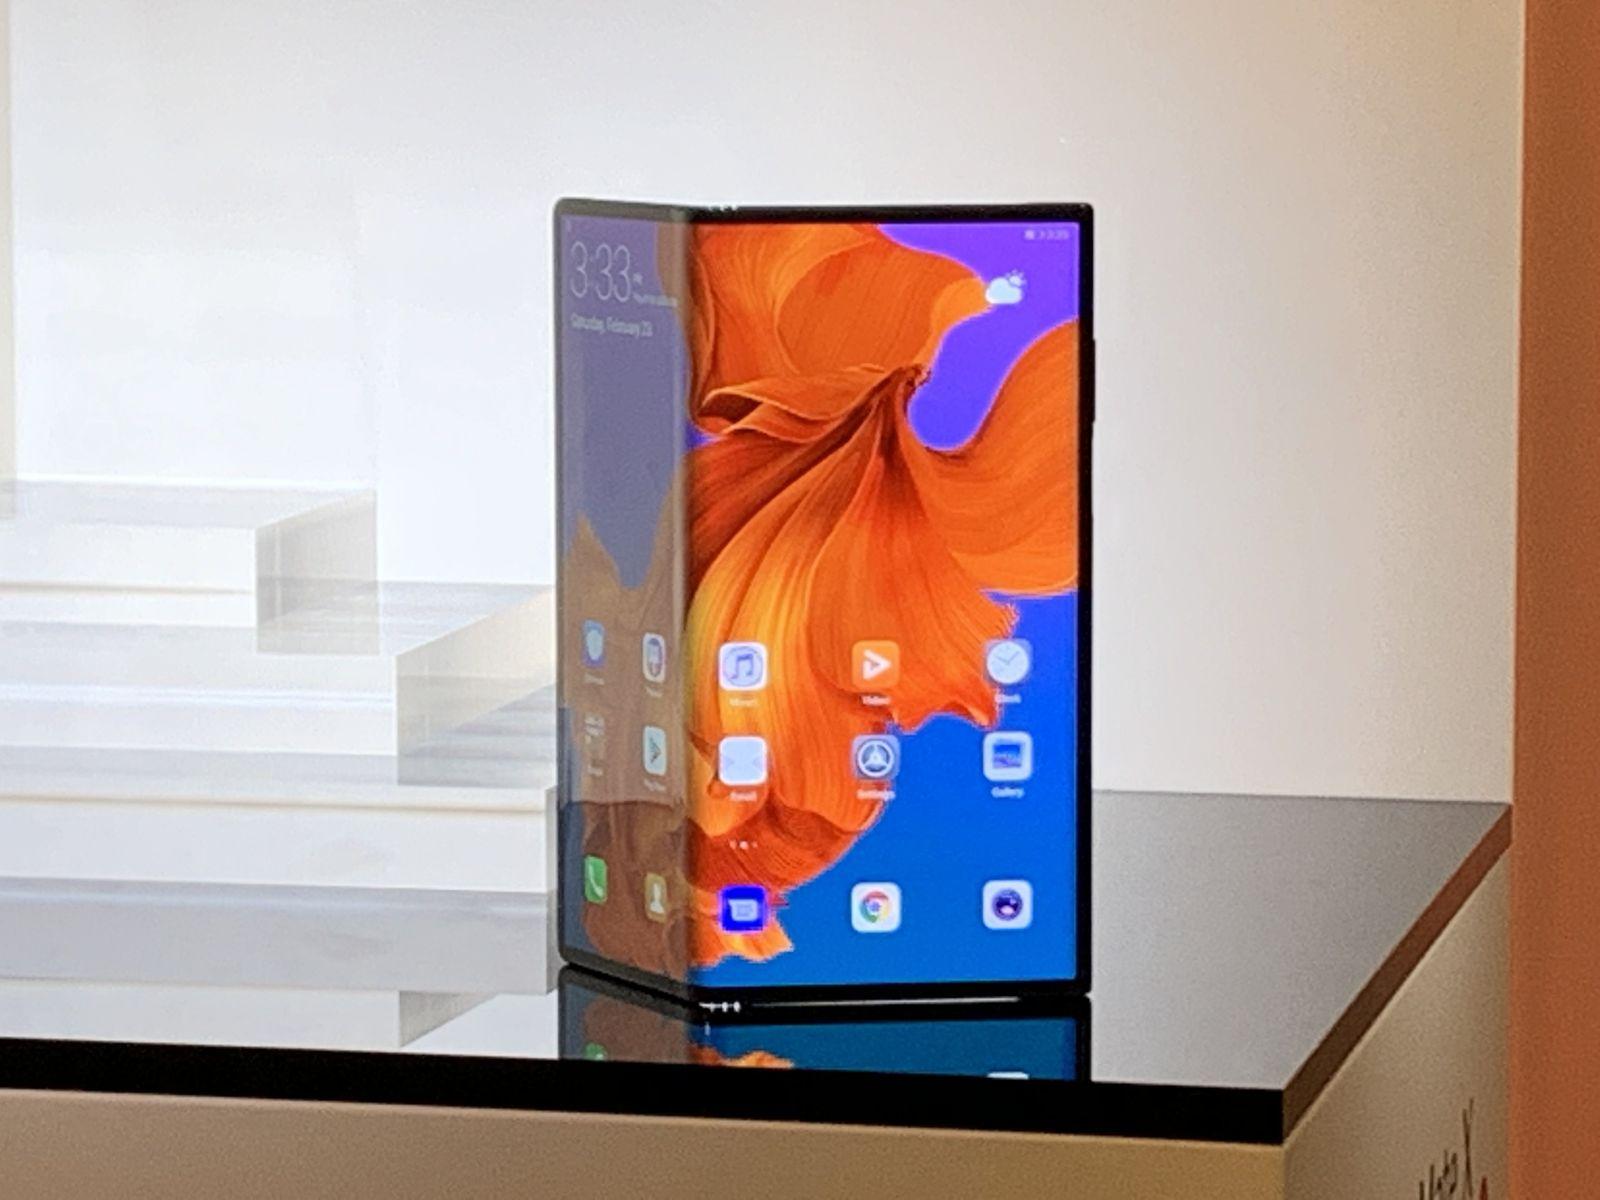 Huawei Mate X / SPERRFRIST 24.2./ 14:45 Uhr